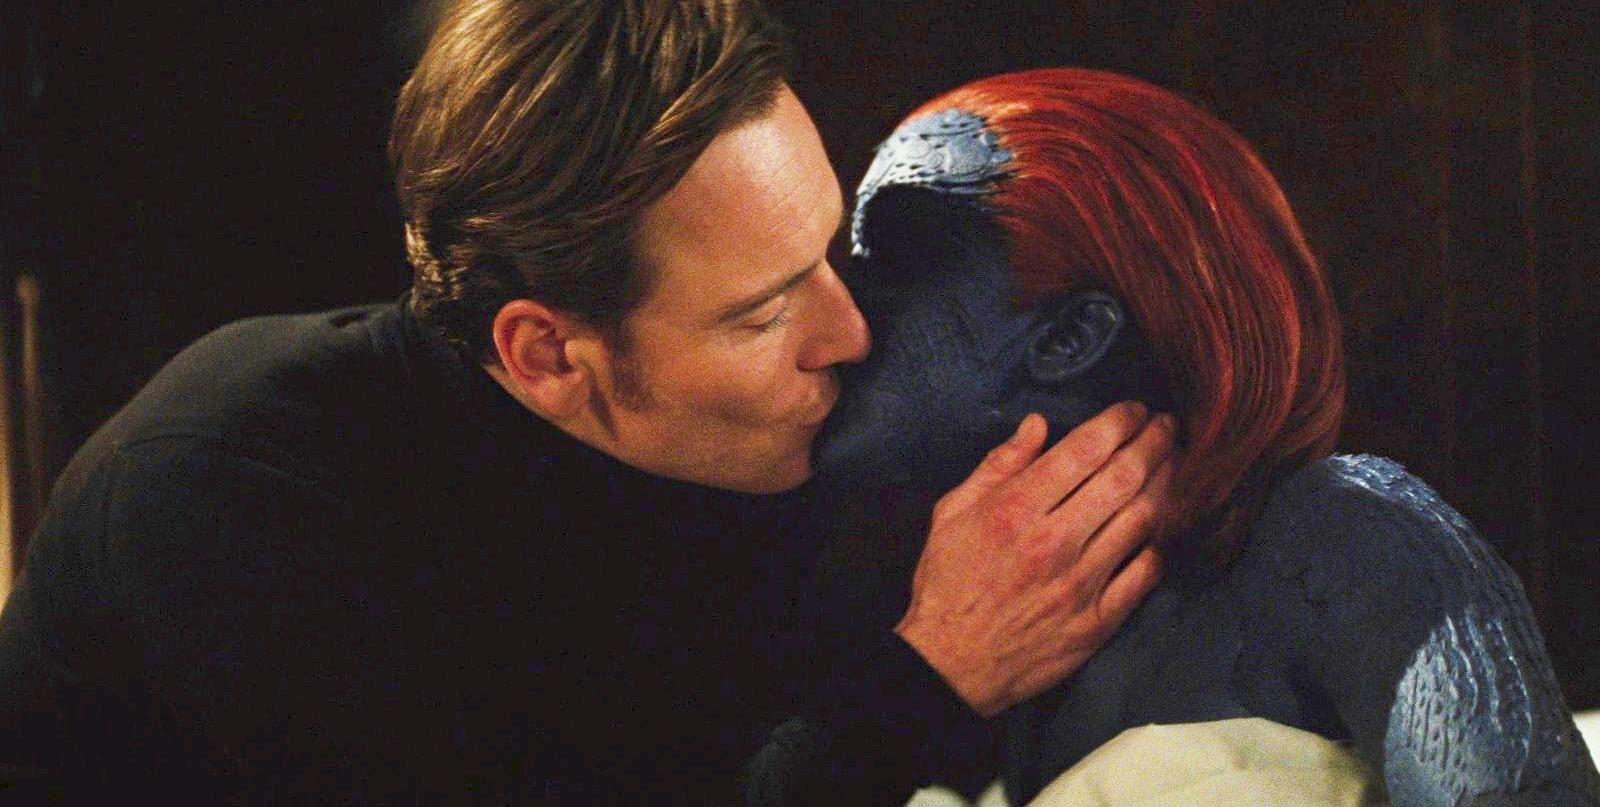 magneto_mystique_kiss.jpg